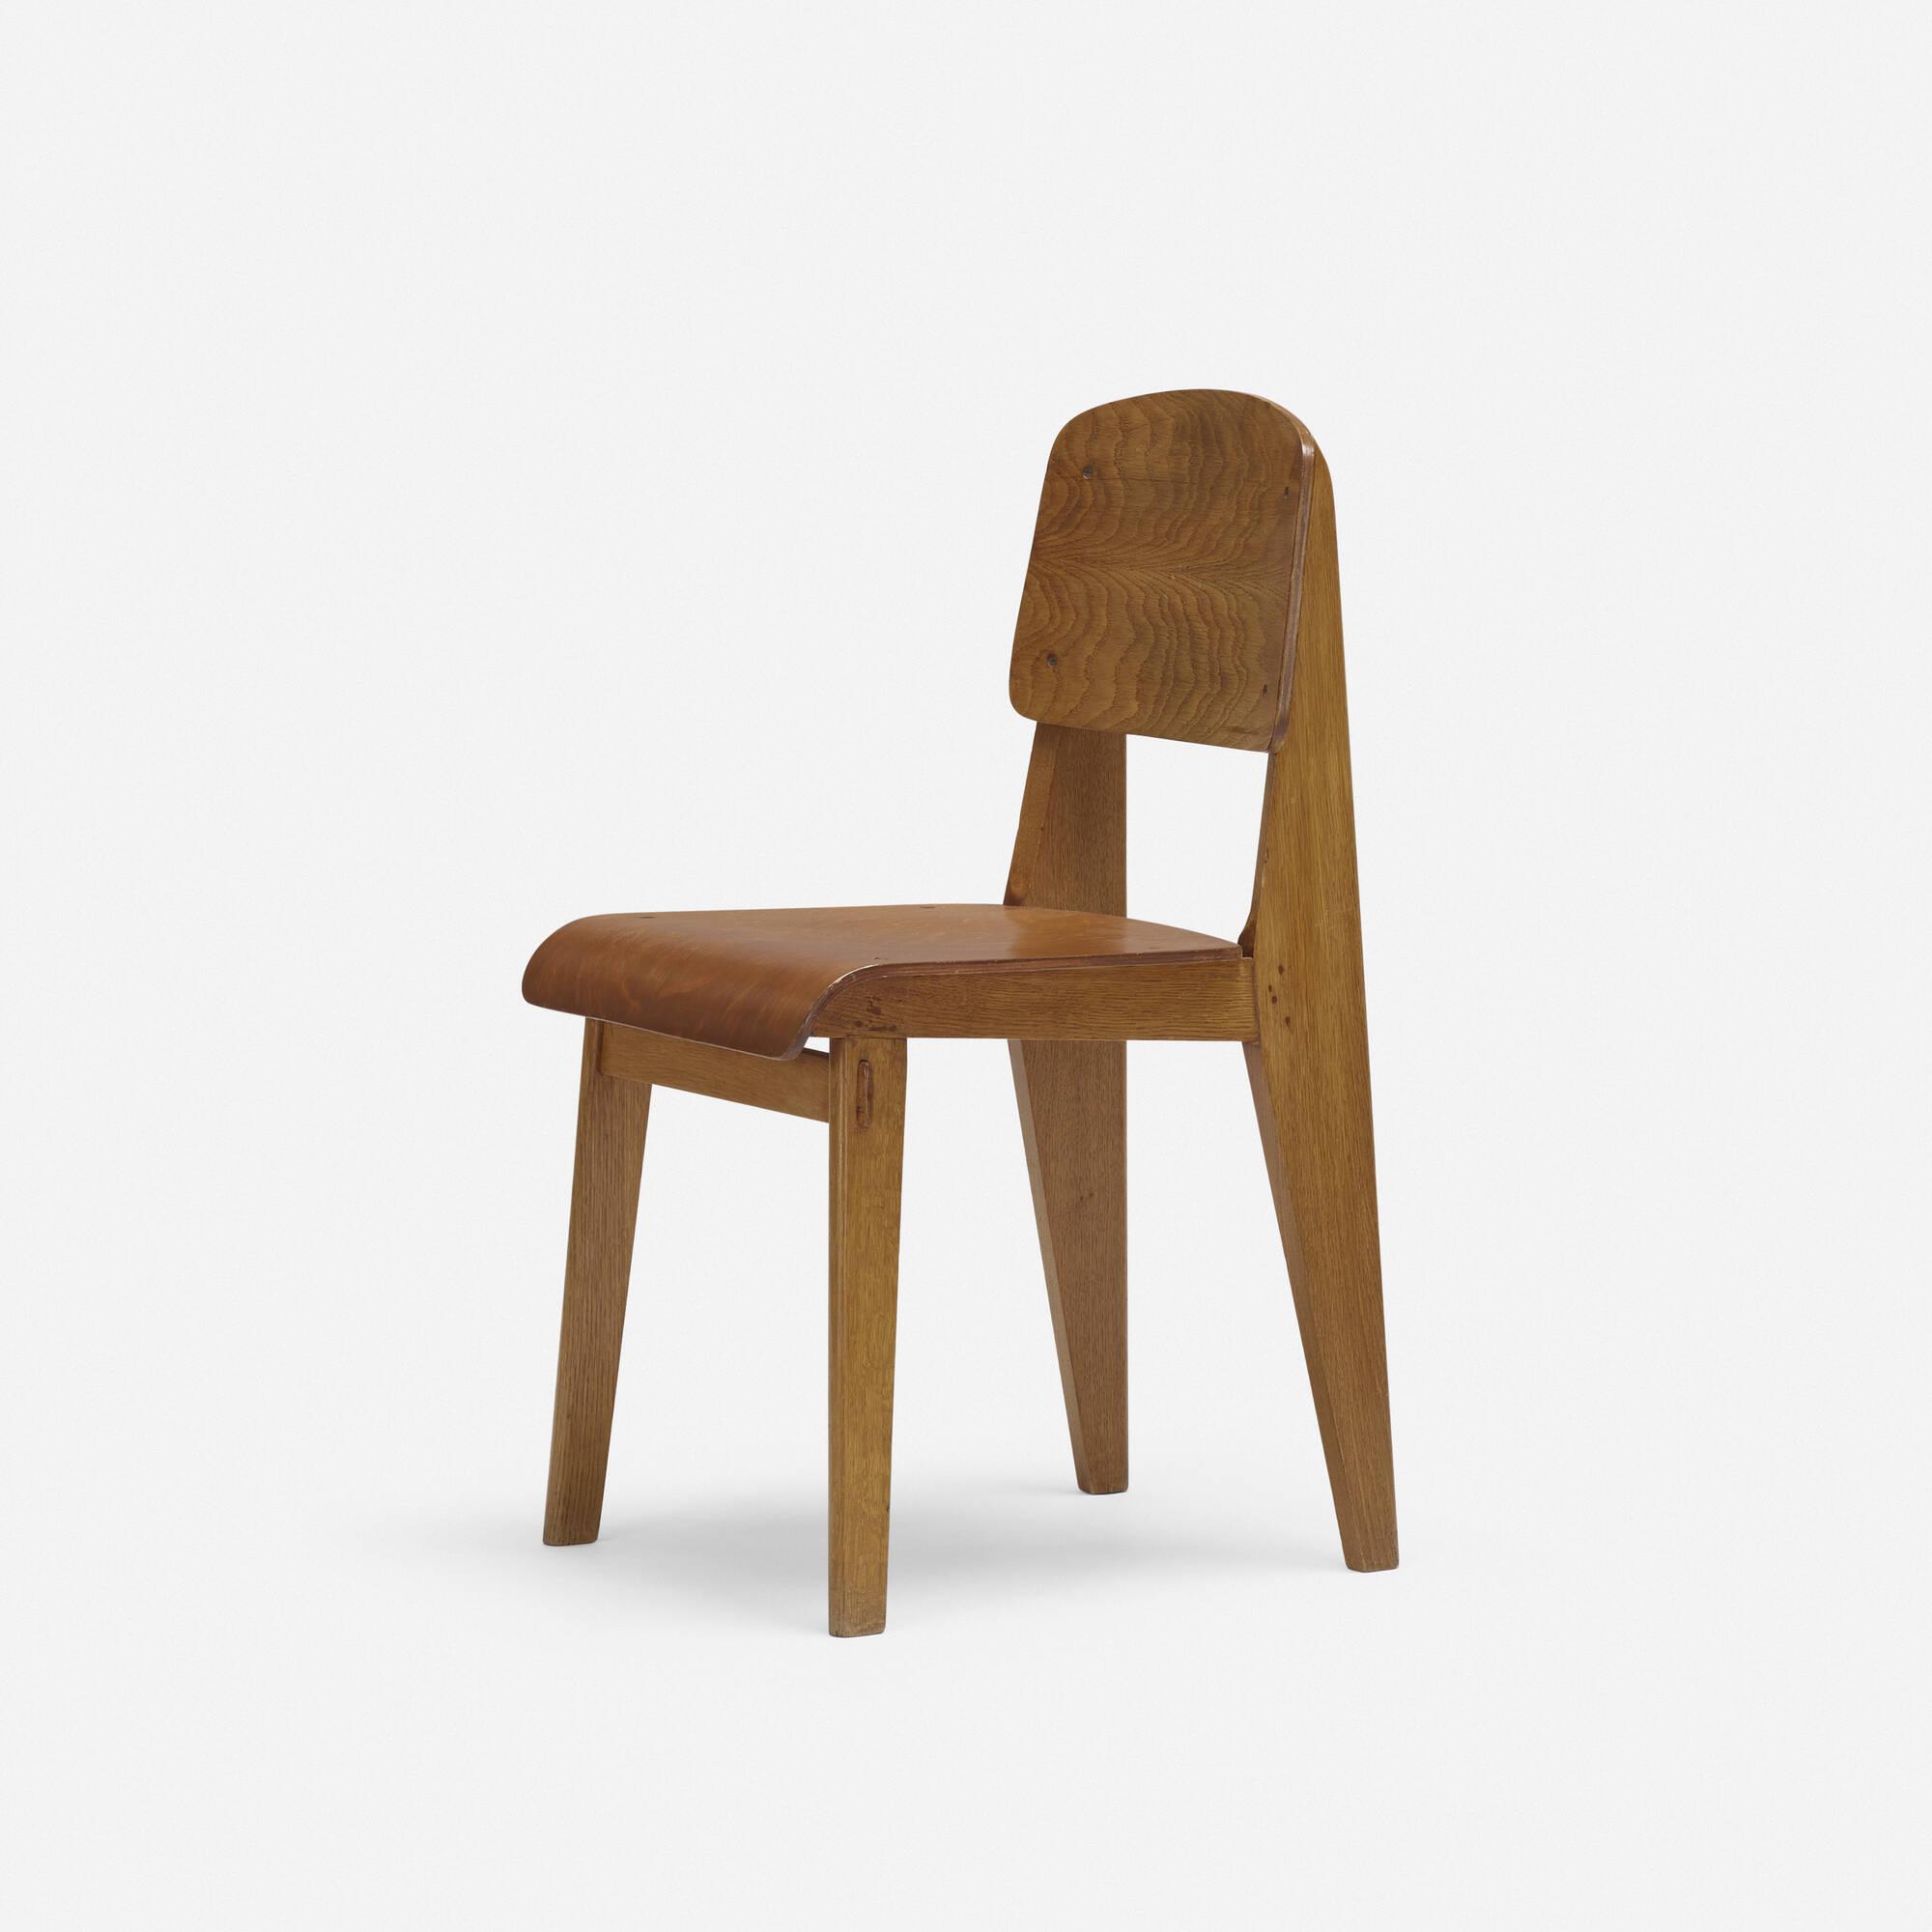 133 JEAN PROUV Standard chair no 305